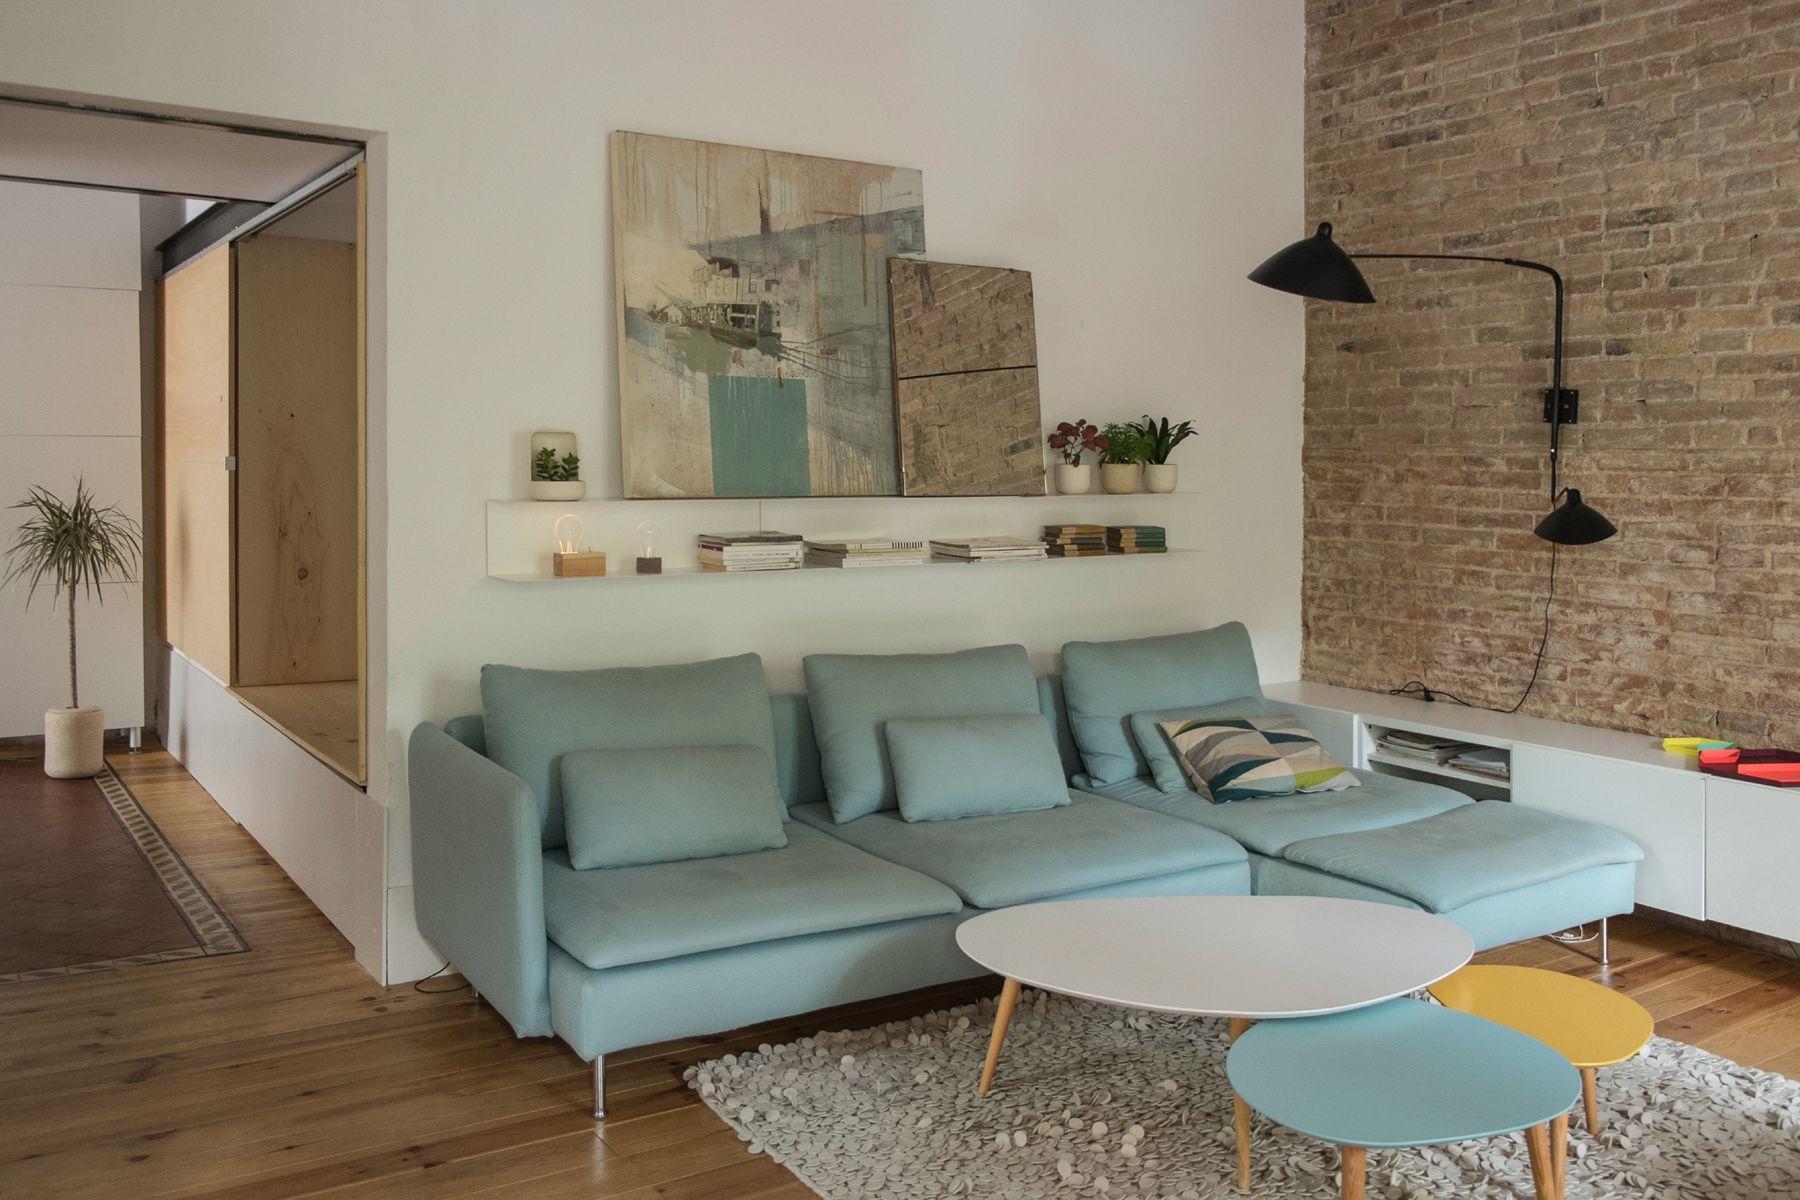 eae65a60efc737dd27c43f887c75e05f Frais De Bar De Salon Ikea Concept